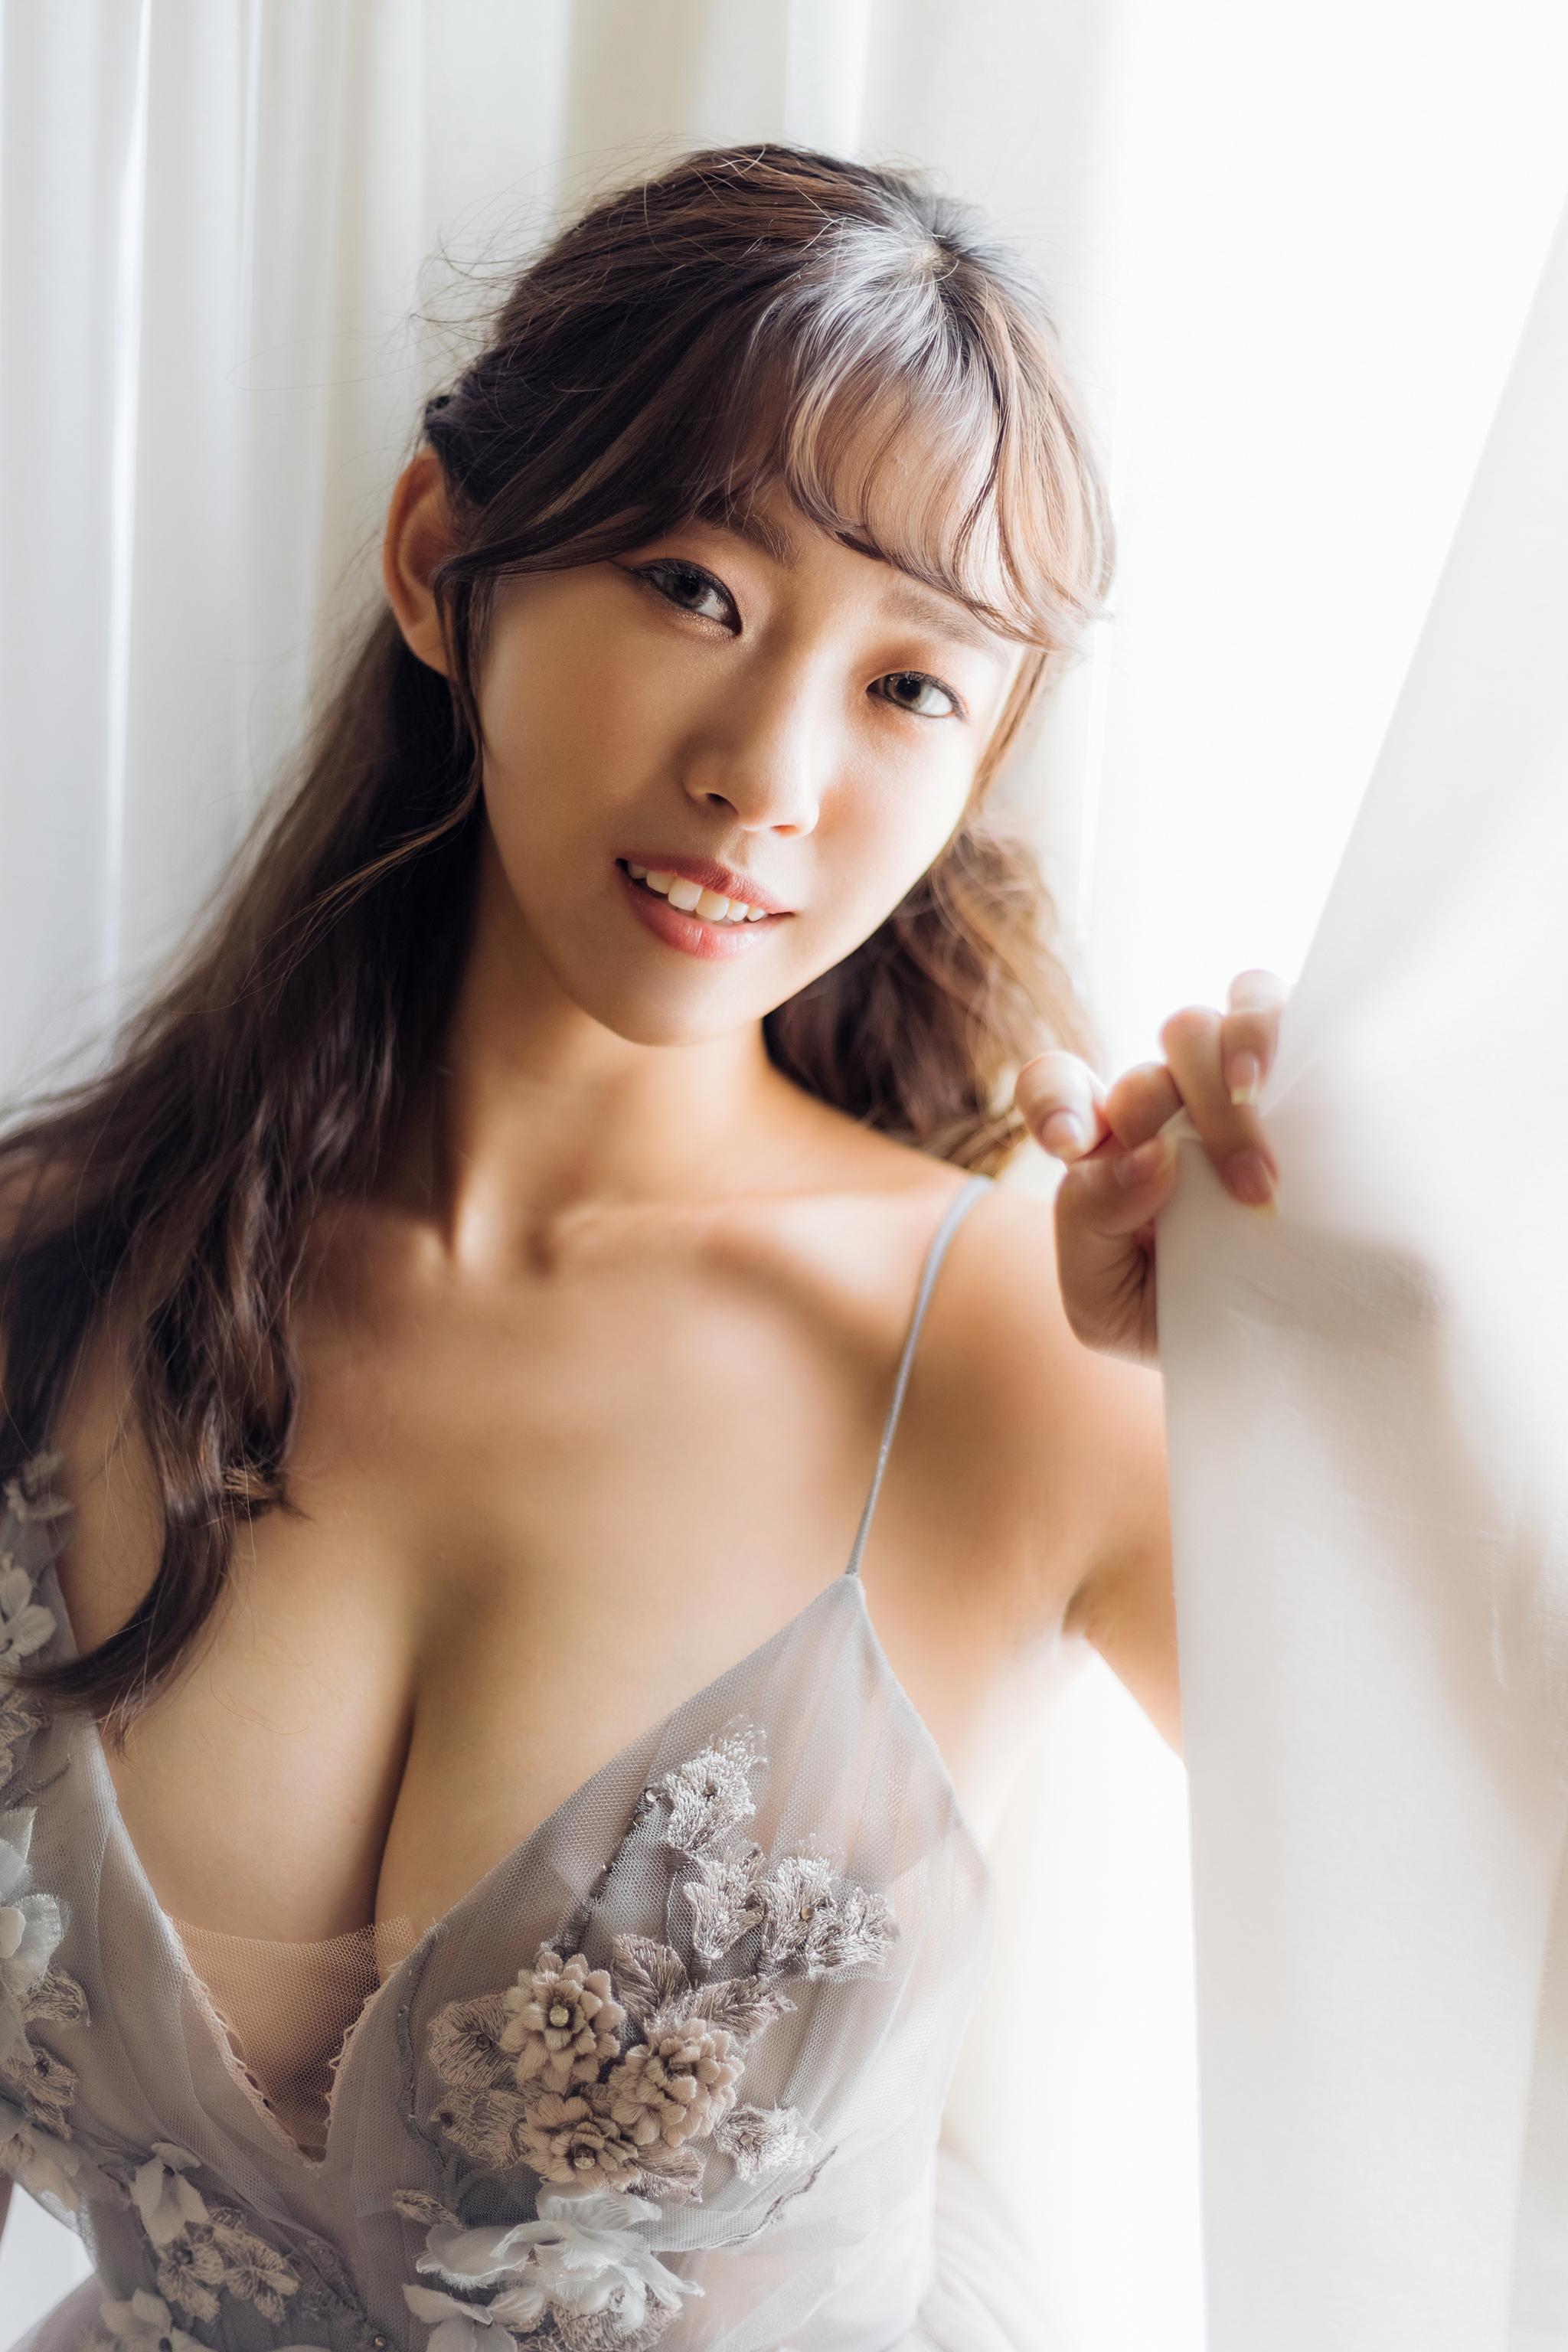 51576641592 d5589e4a2d o - 【自主婚紗】+江jiang+